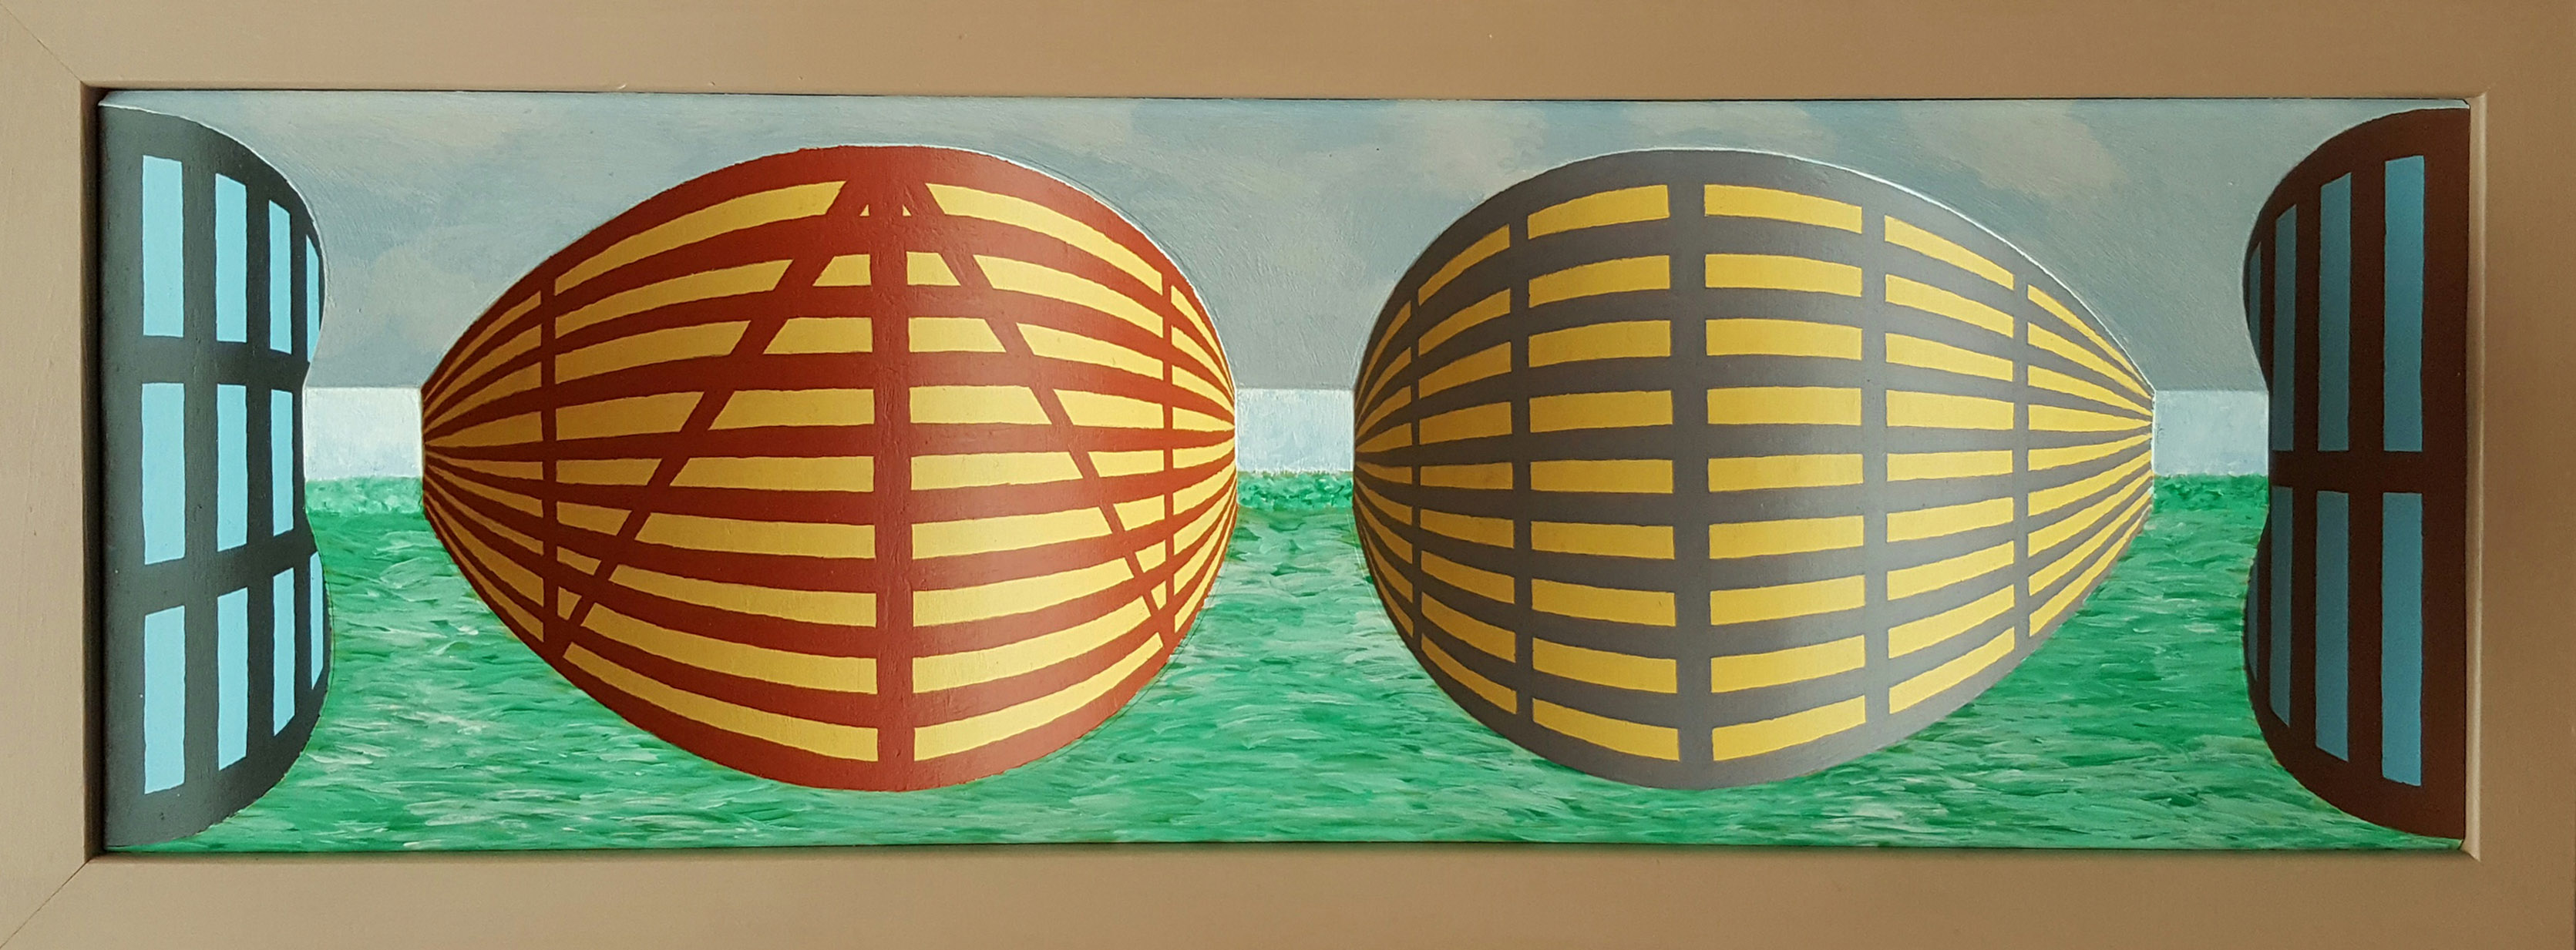 Lagoon Tower Blocks reverse perspective art